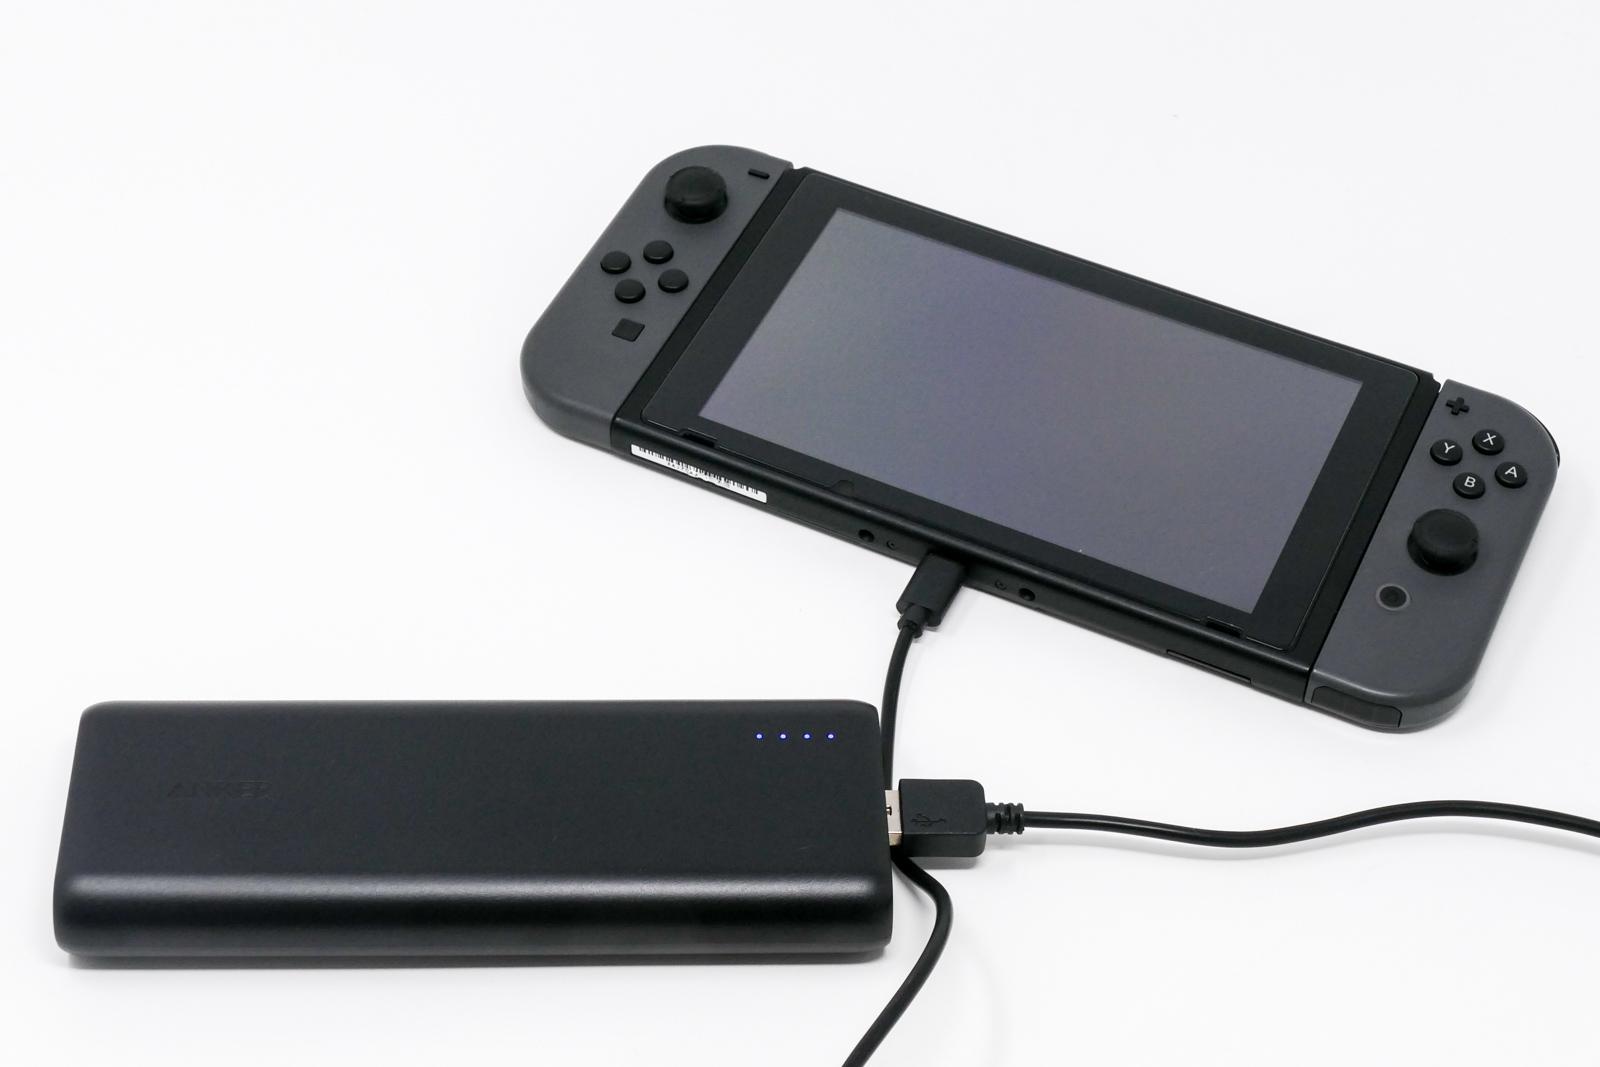 Nintendo SwitchとANKERのモバイルバッテリー